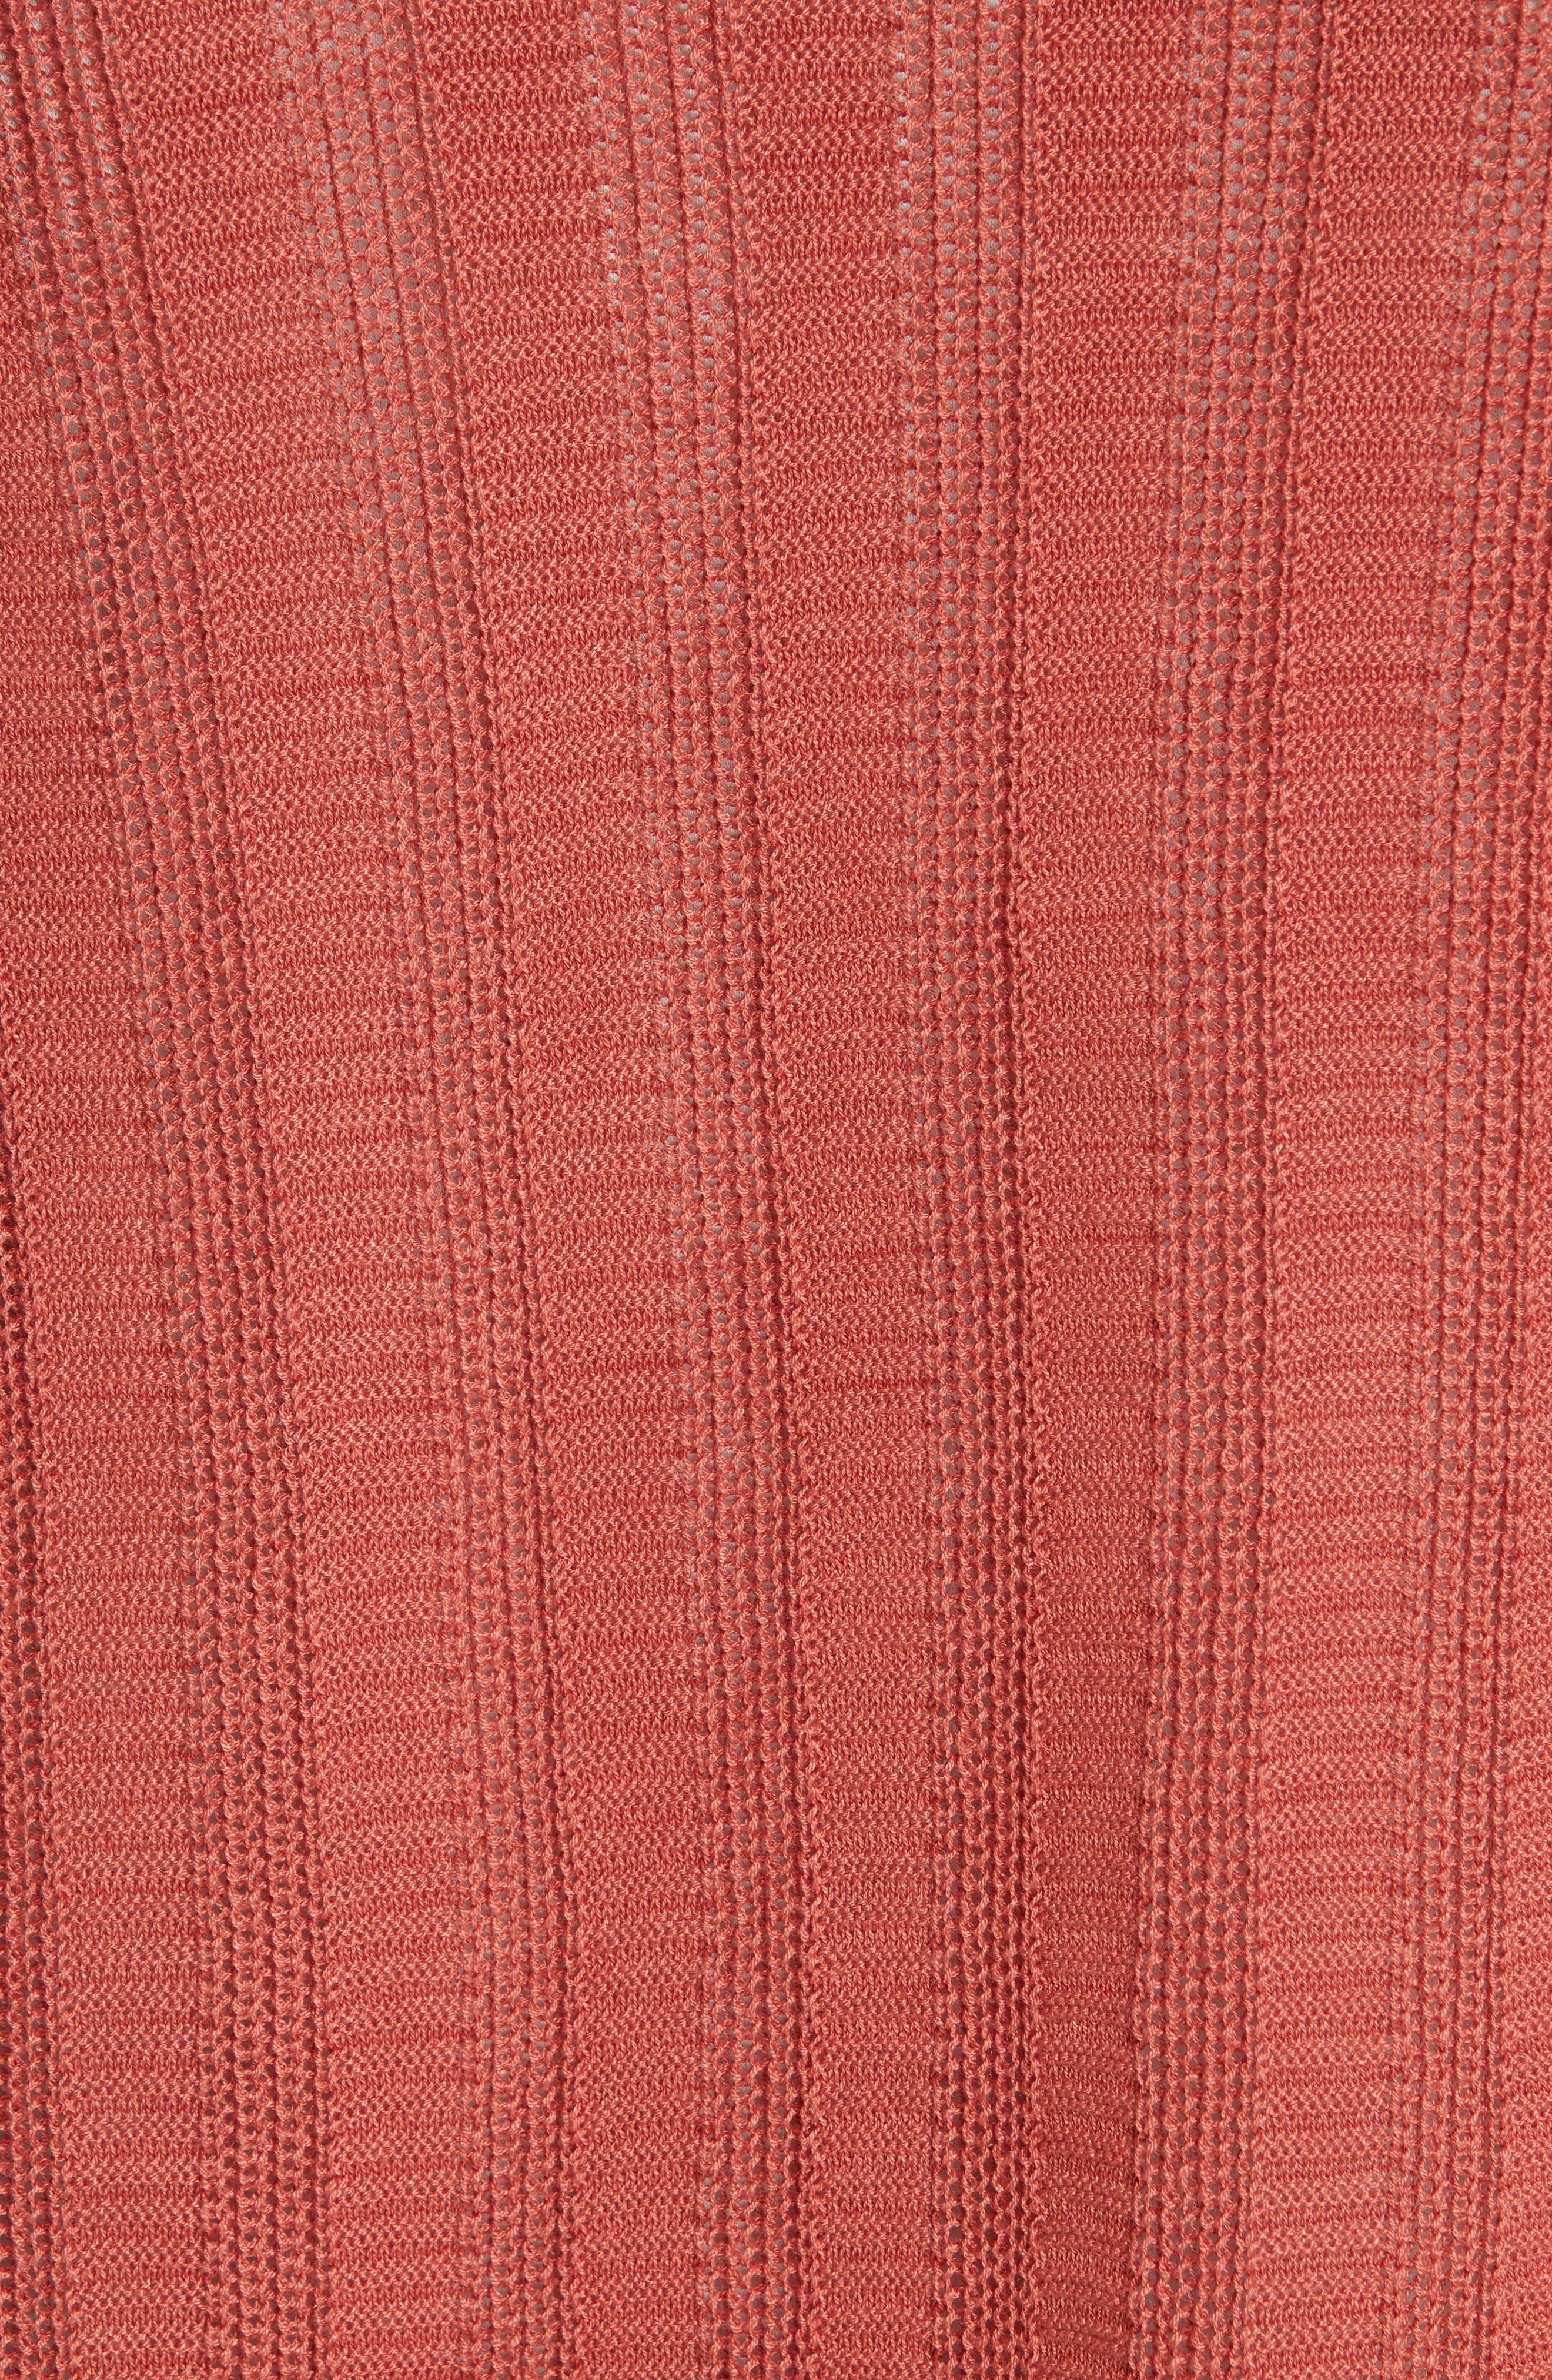 Bell Cuff Silk Blend Cardigan,                             Alternate thumbnail 5, color,                             ORANGE PEKOE